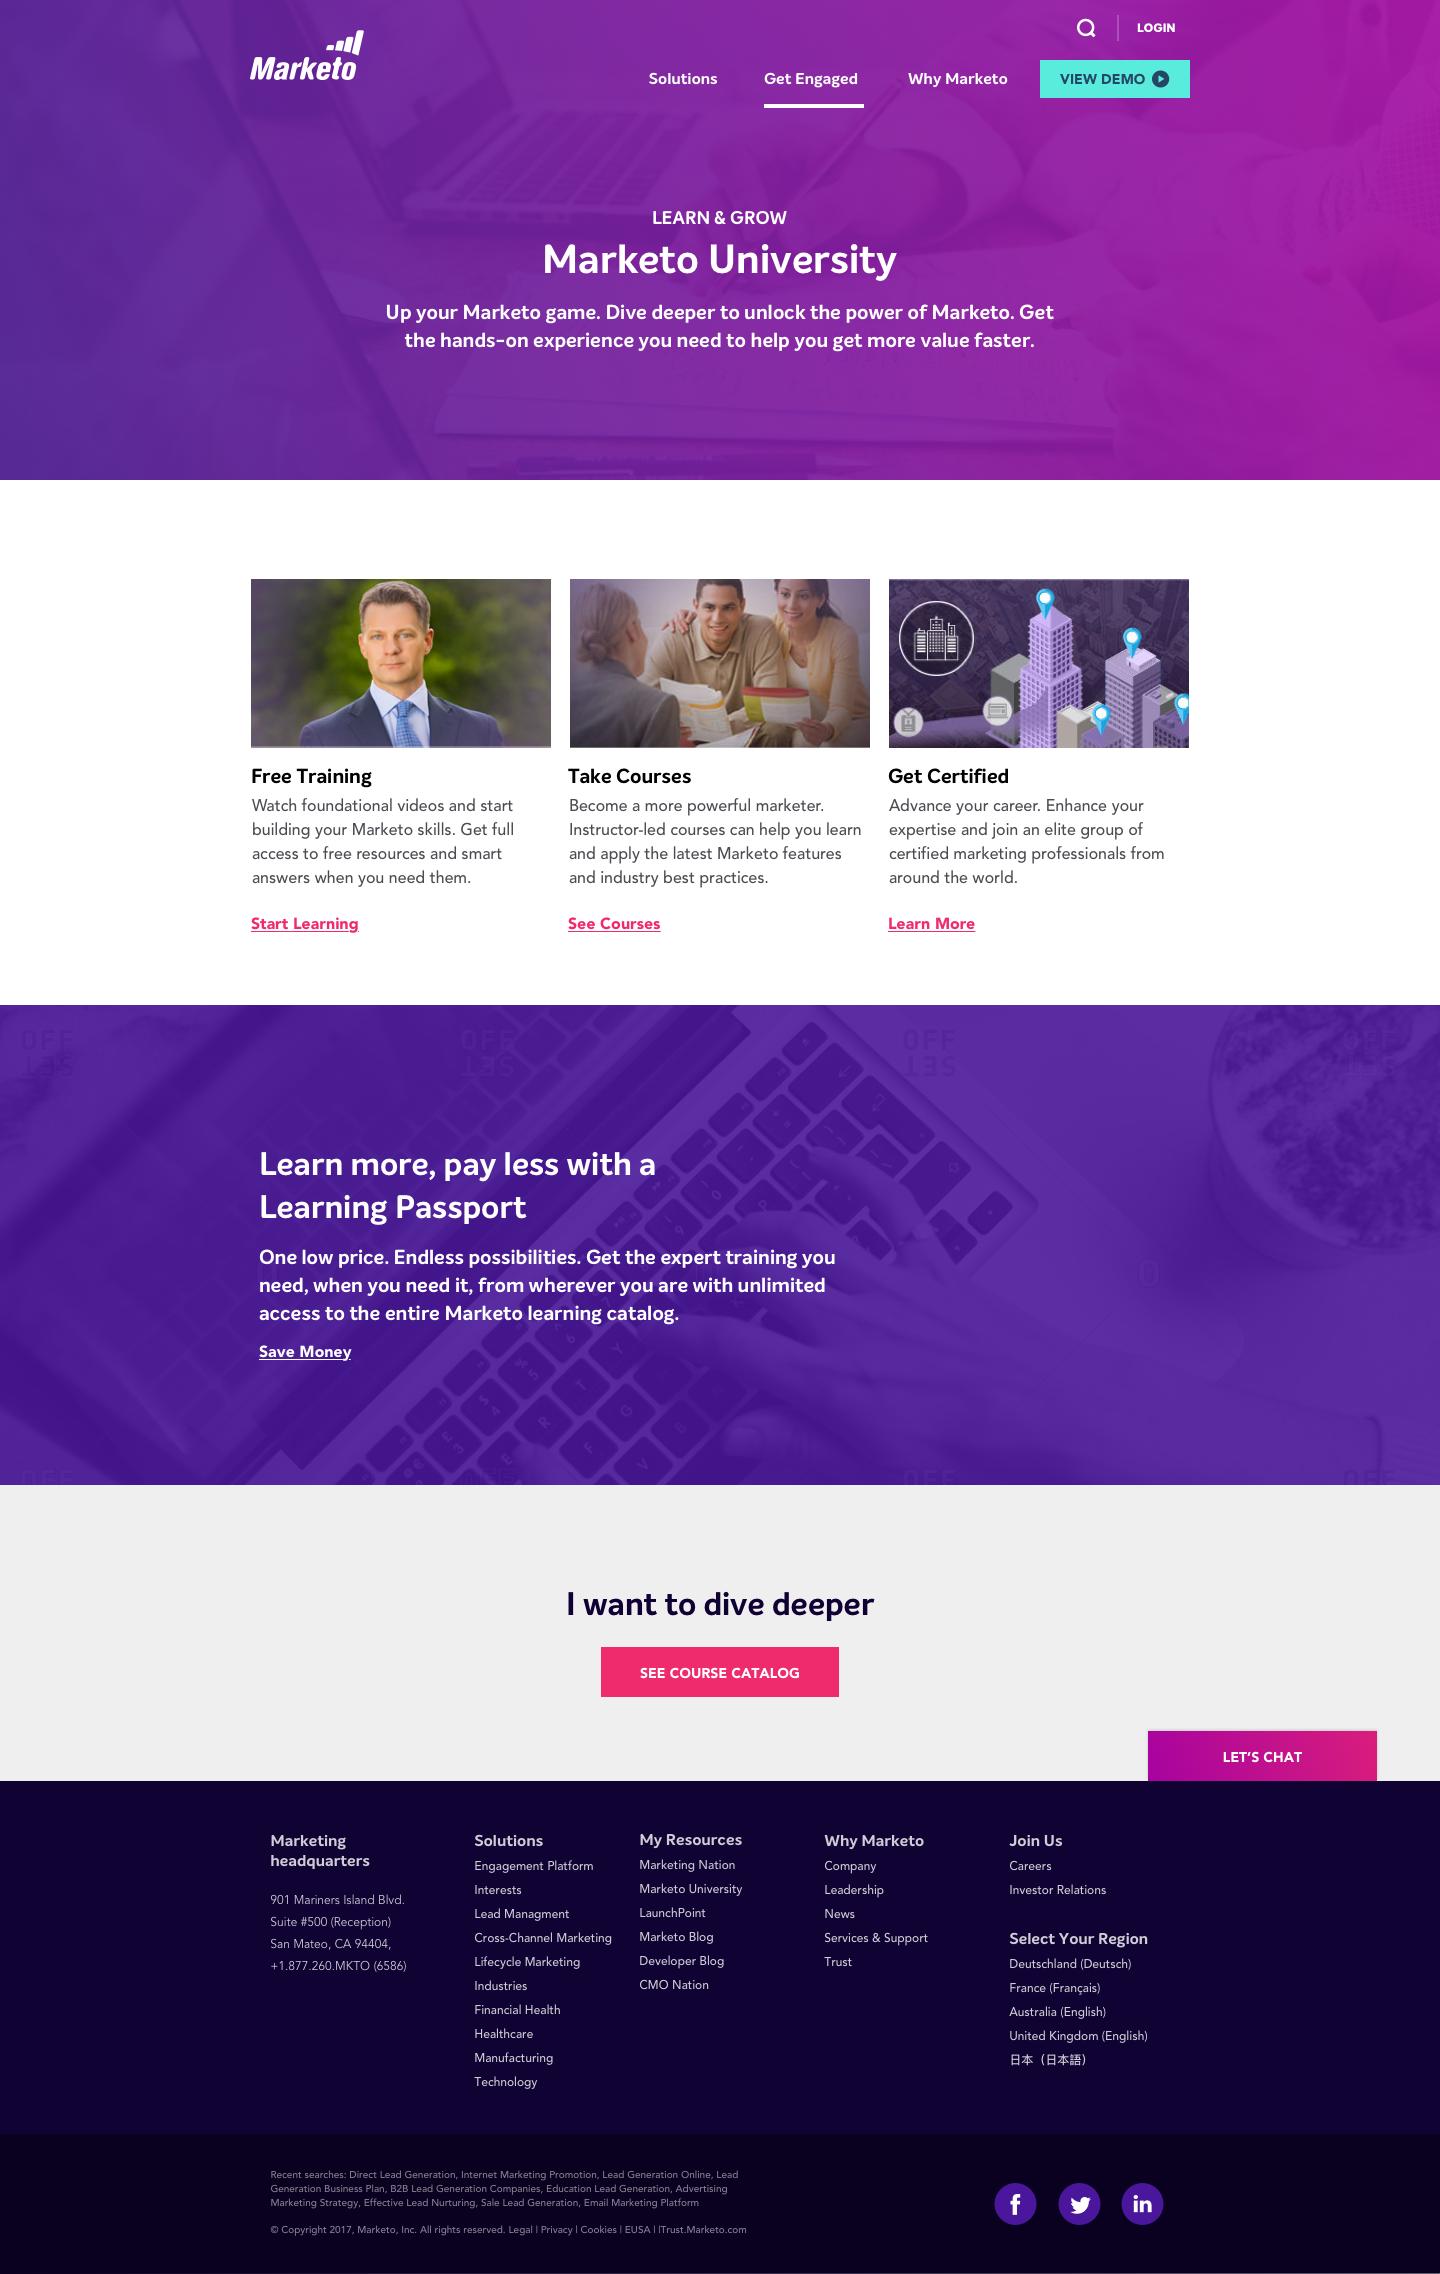 marketo_university-landing_desktop.png